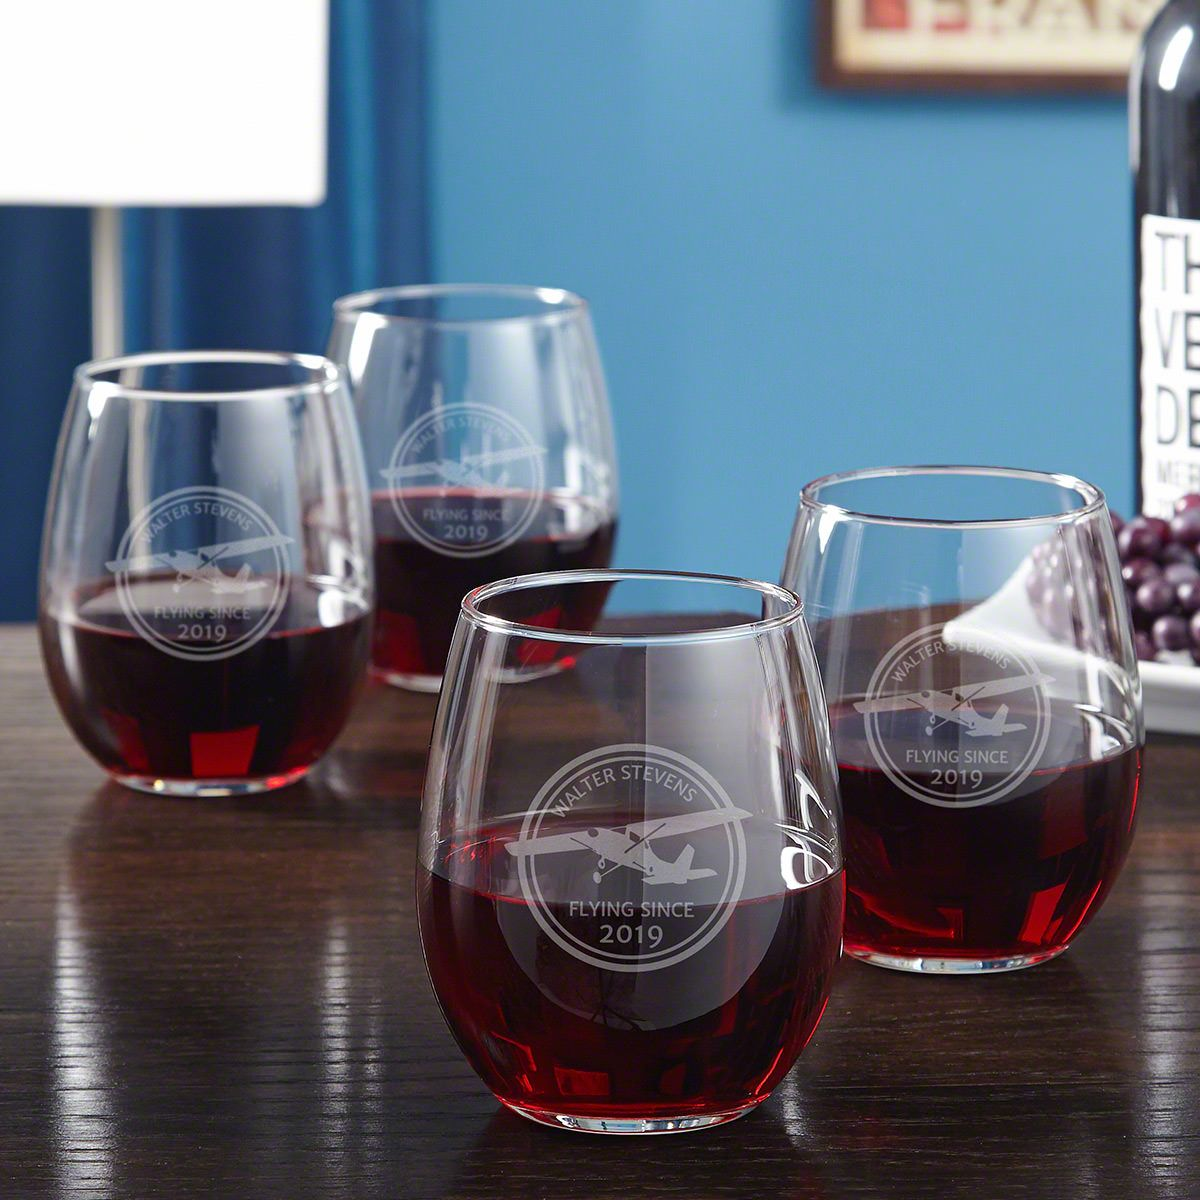 Aviator Personalized Stemless Wine Glasses